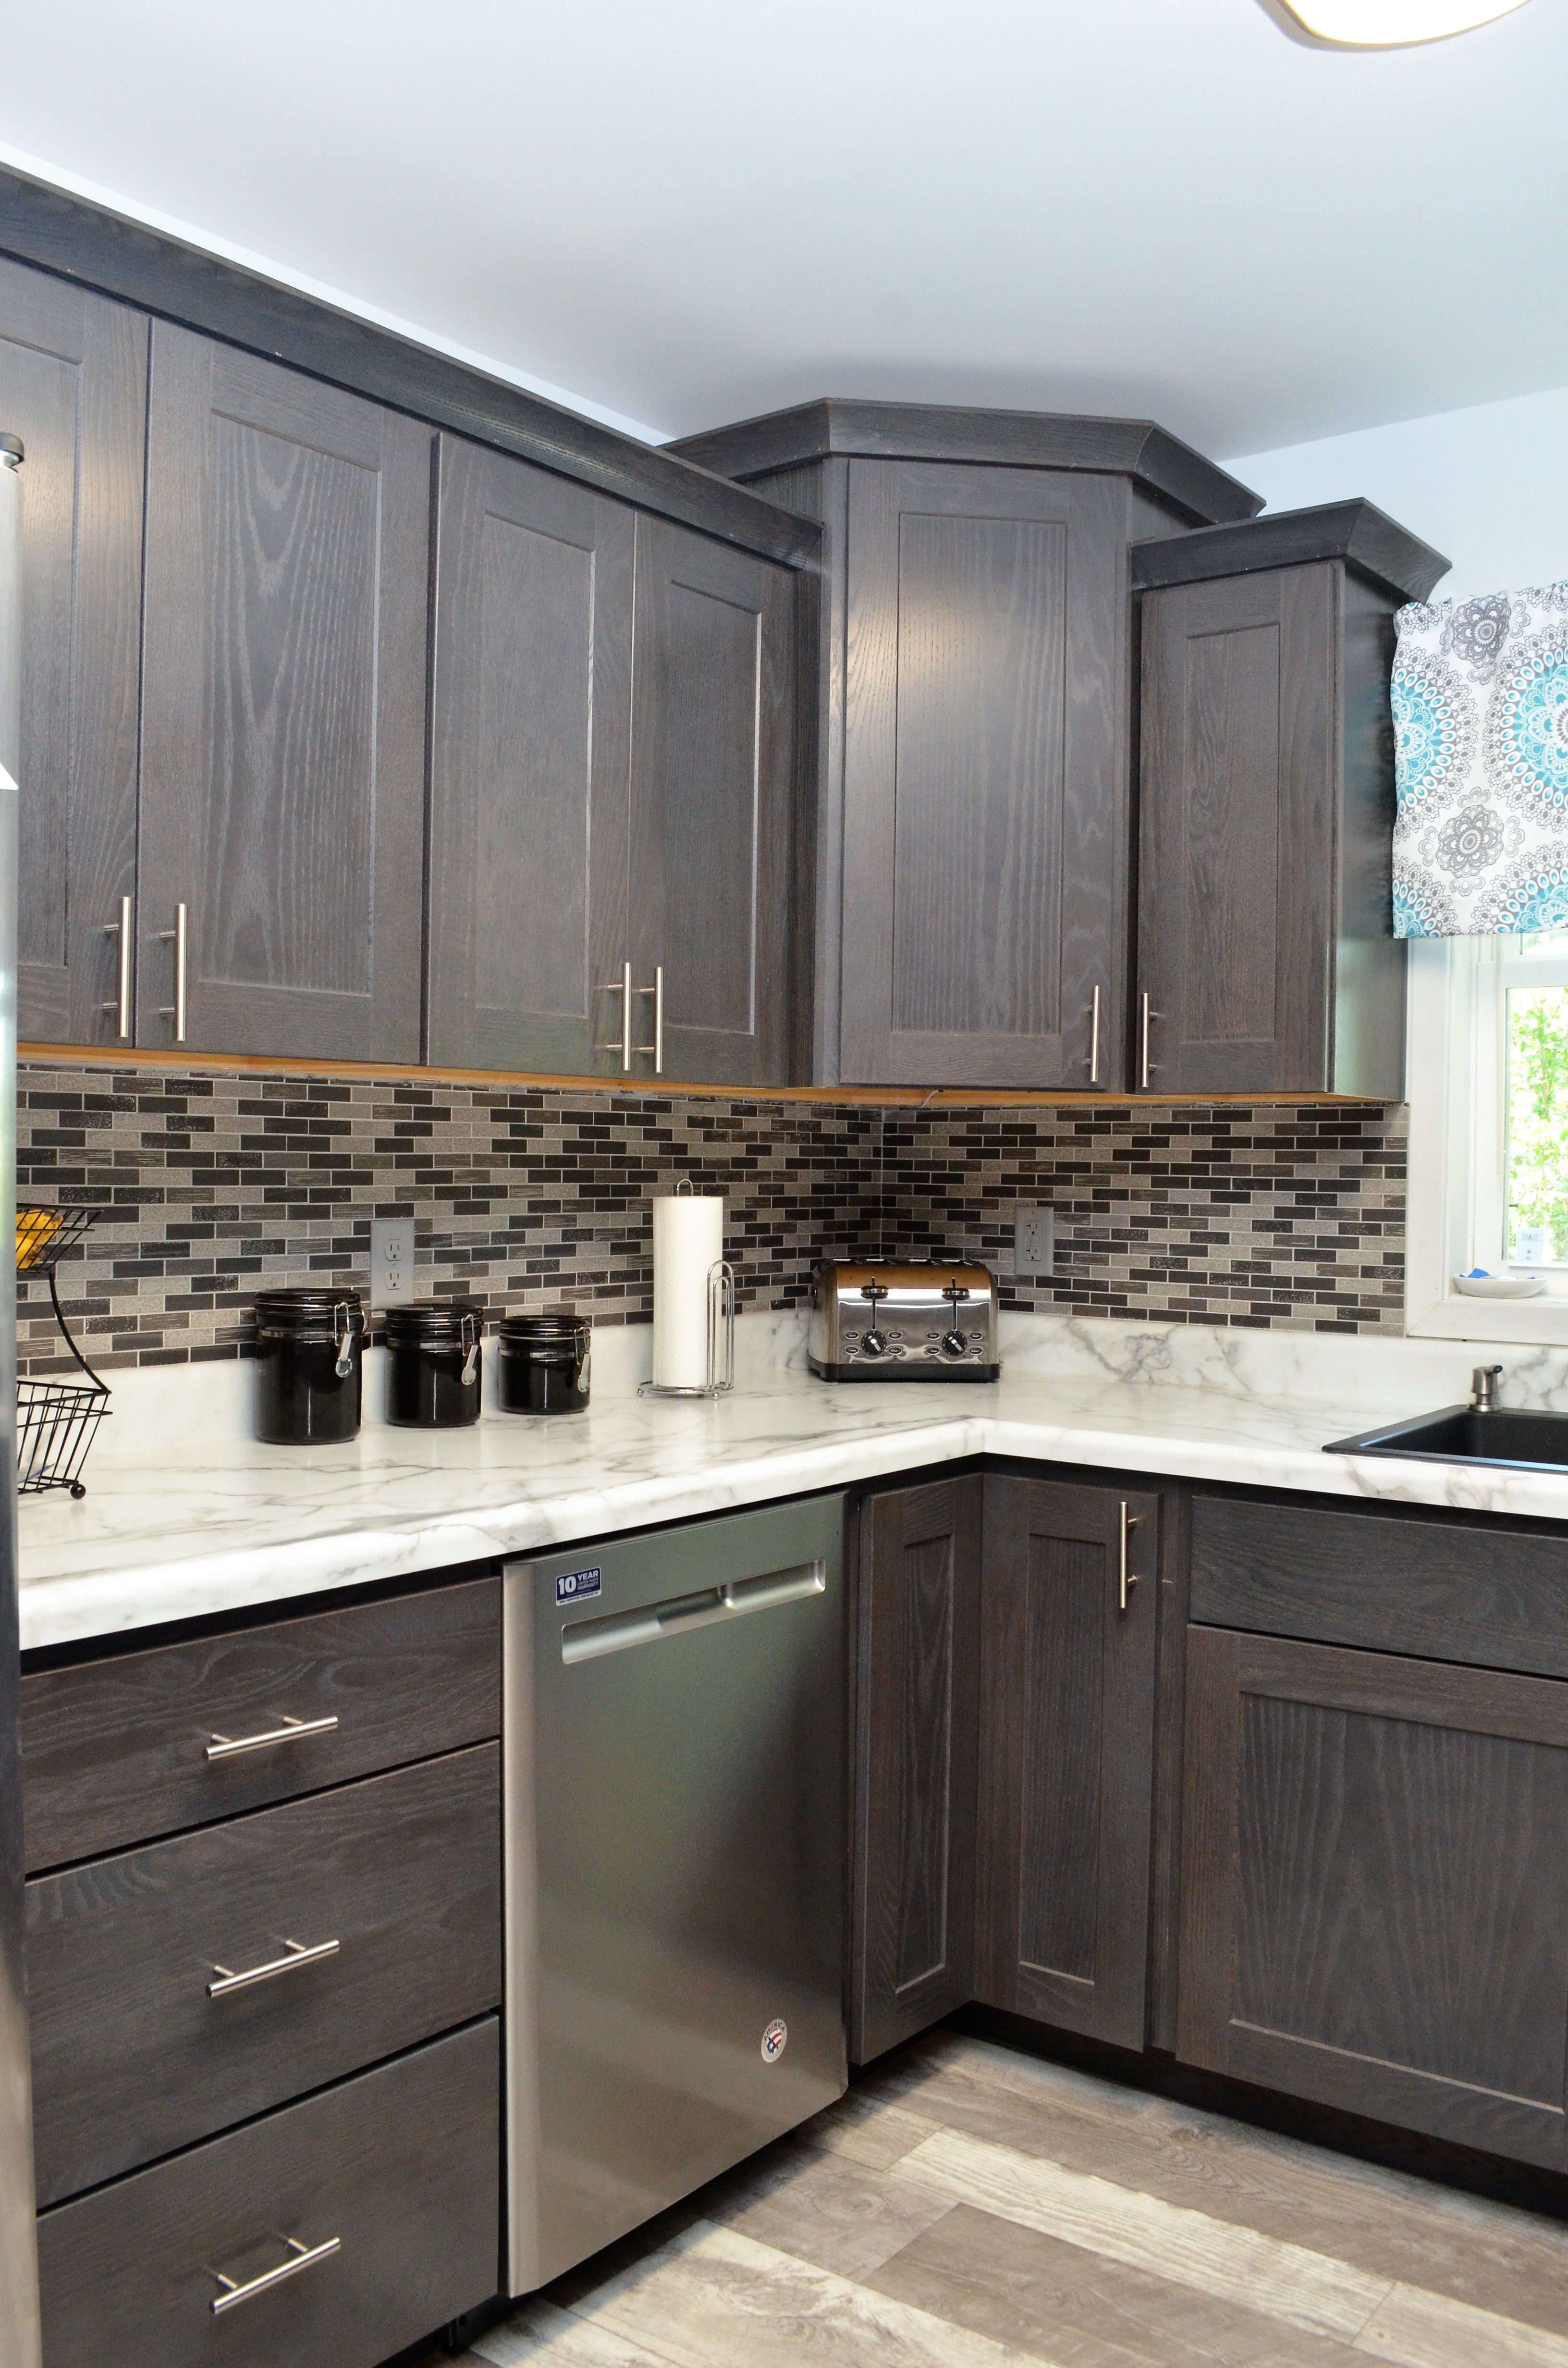 Kountry Wood Products Jamestown Driftwood Oak Oak Cabinets Cabinetry Kitchen